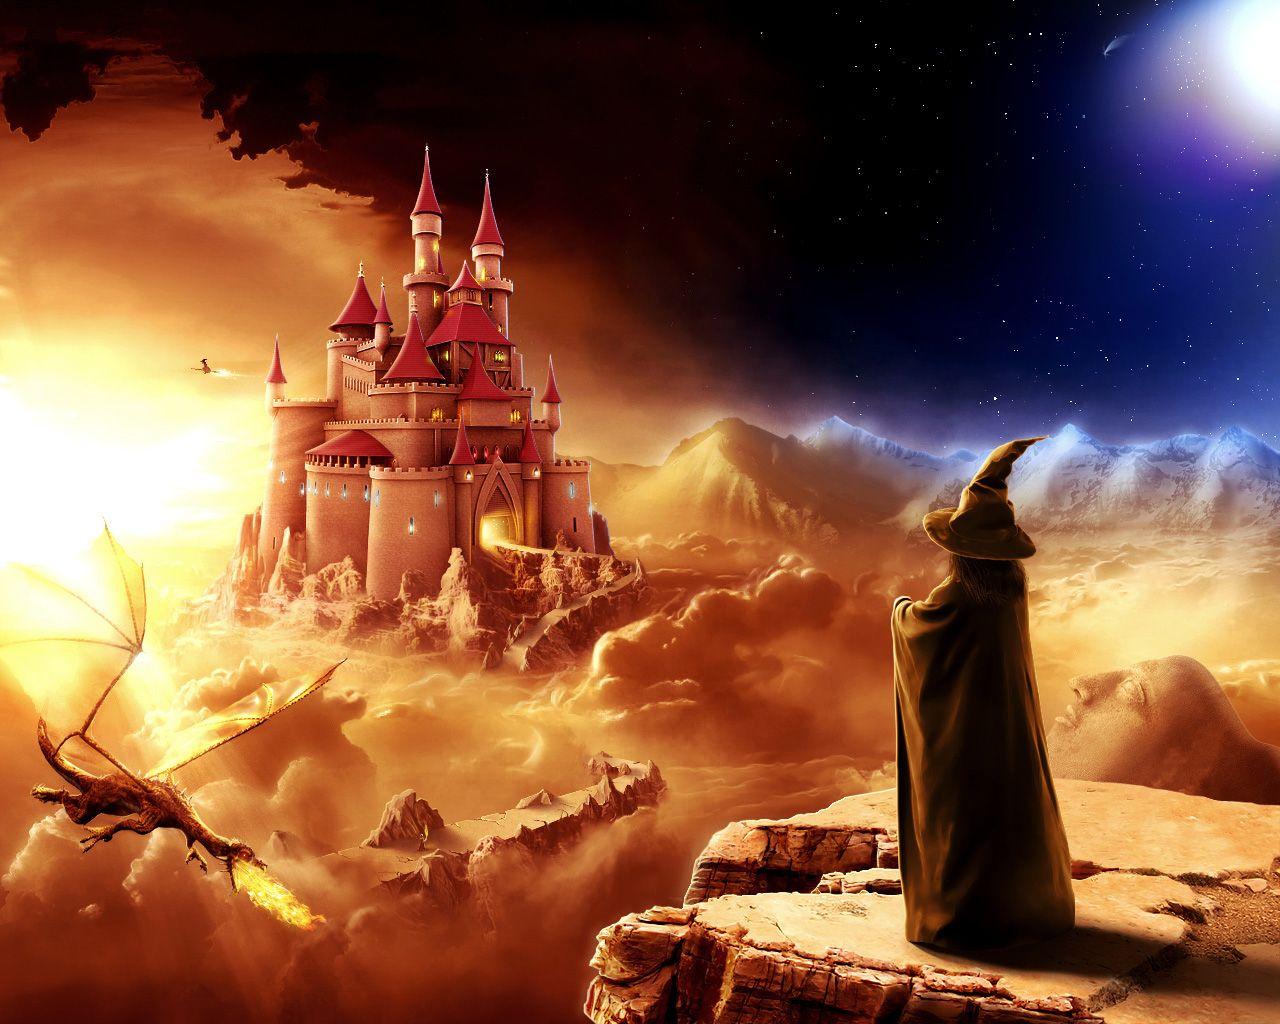 Fanticy Free Online Fantasy Wallpapers Full Hd Desktop Backgrounds Fantasy Castle Fantasy Pictures Fantasy Wizard